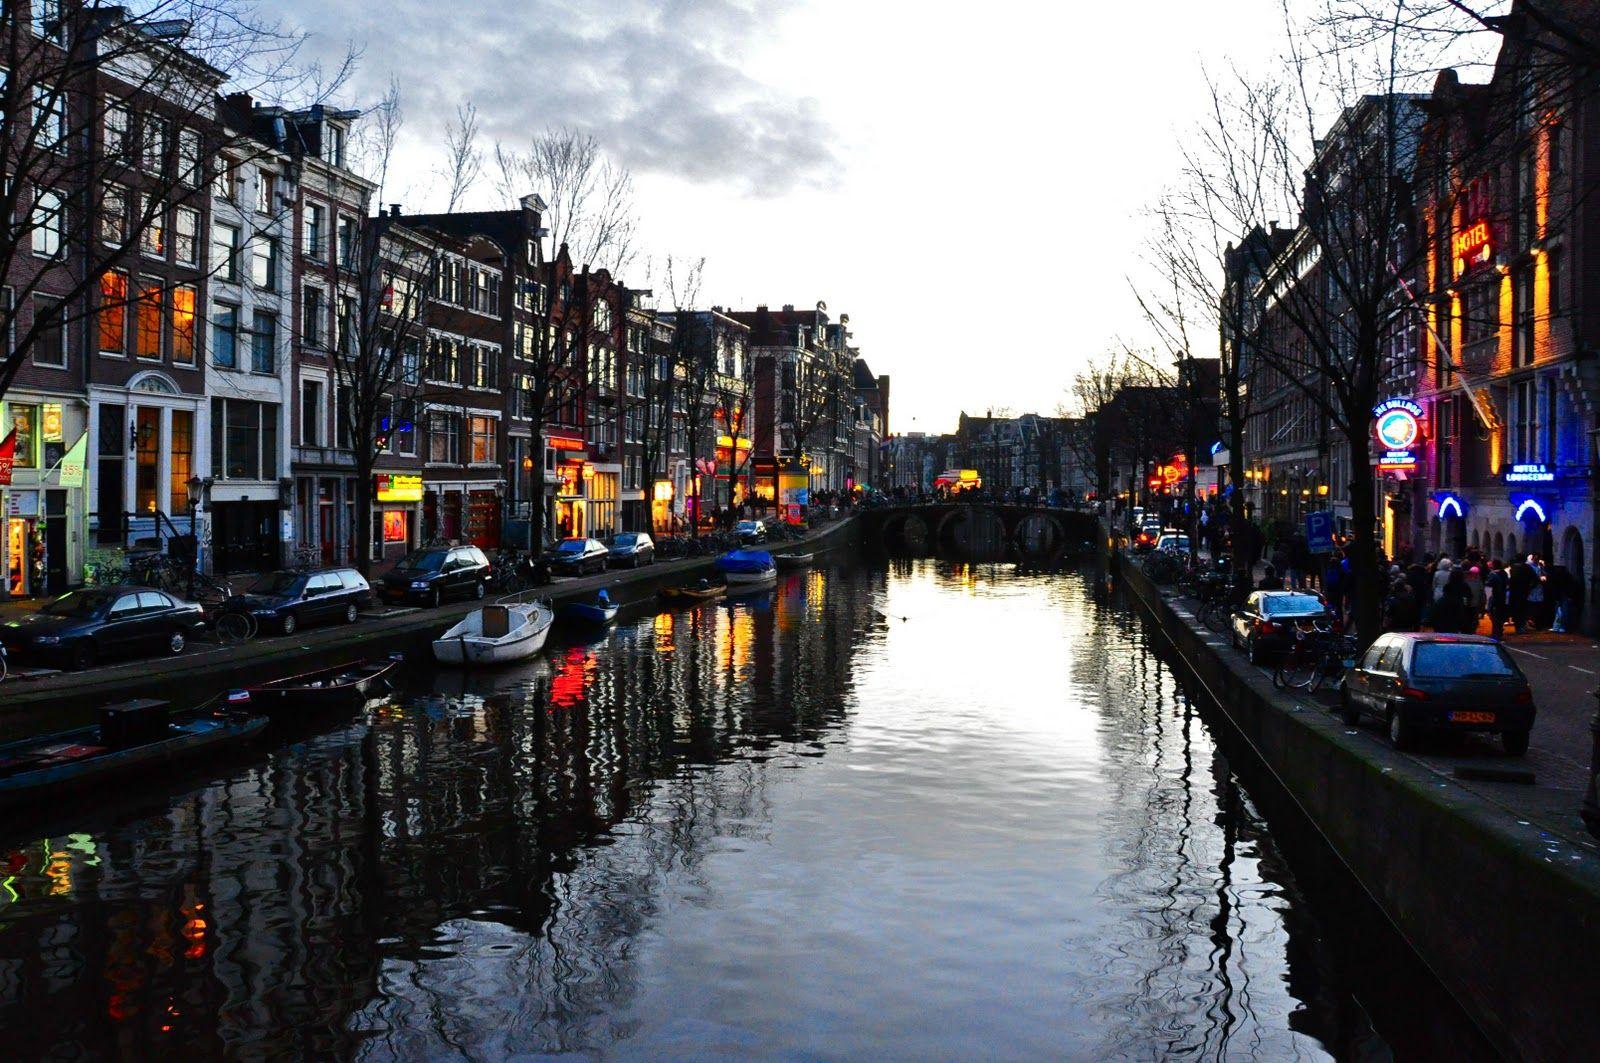 Amsterdam on dusk via: Behind The Lens Lukey: I AMsterdam